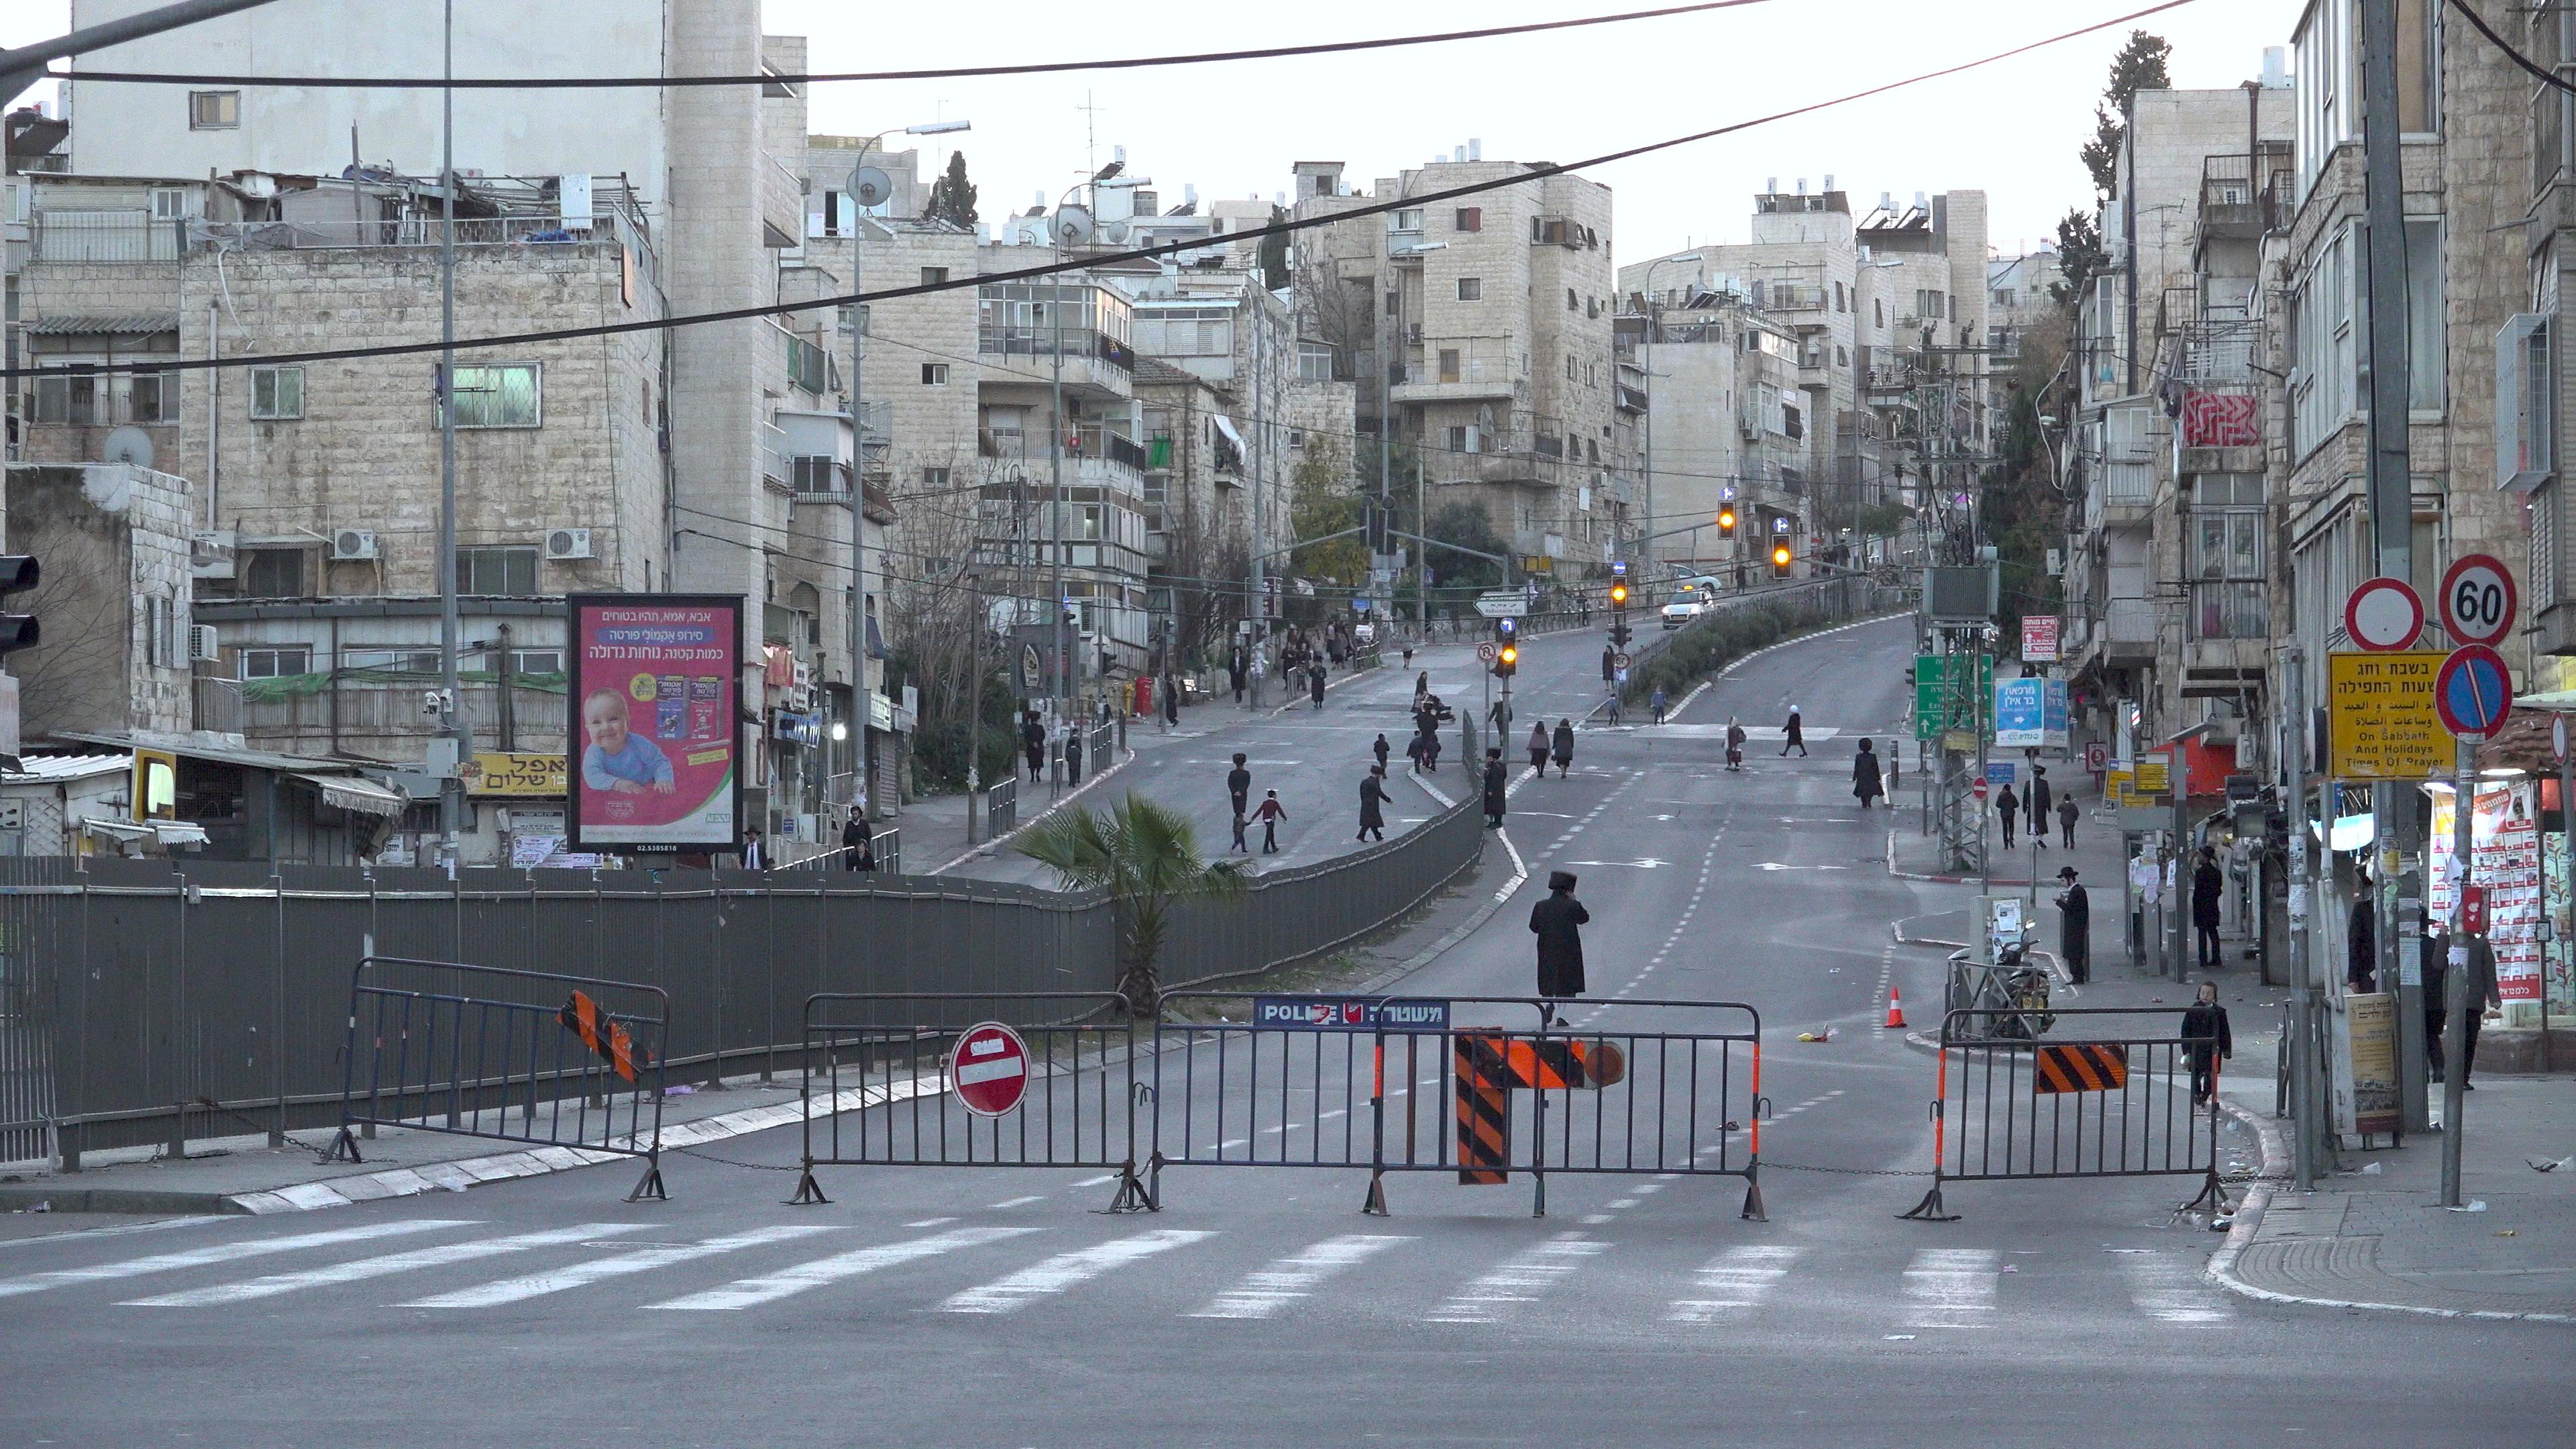 THEOS & KRATEO 2018—2021 4 min 42 sec.  Jerusalem ; Bar ilan junction & Buchrim junction, adjustment to 100 gates neighborhood. Synchronized video diptych, loop